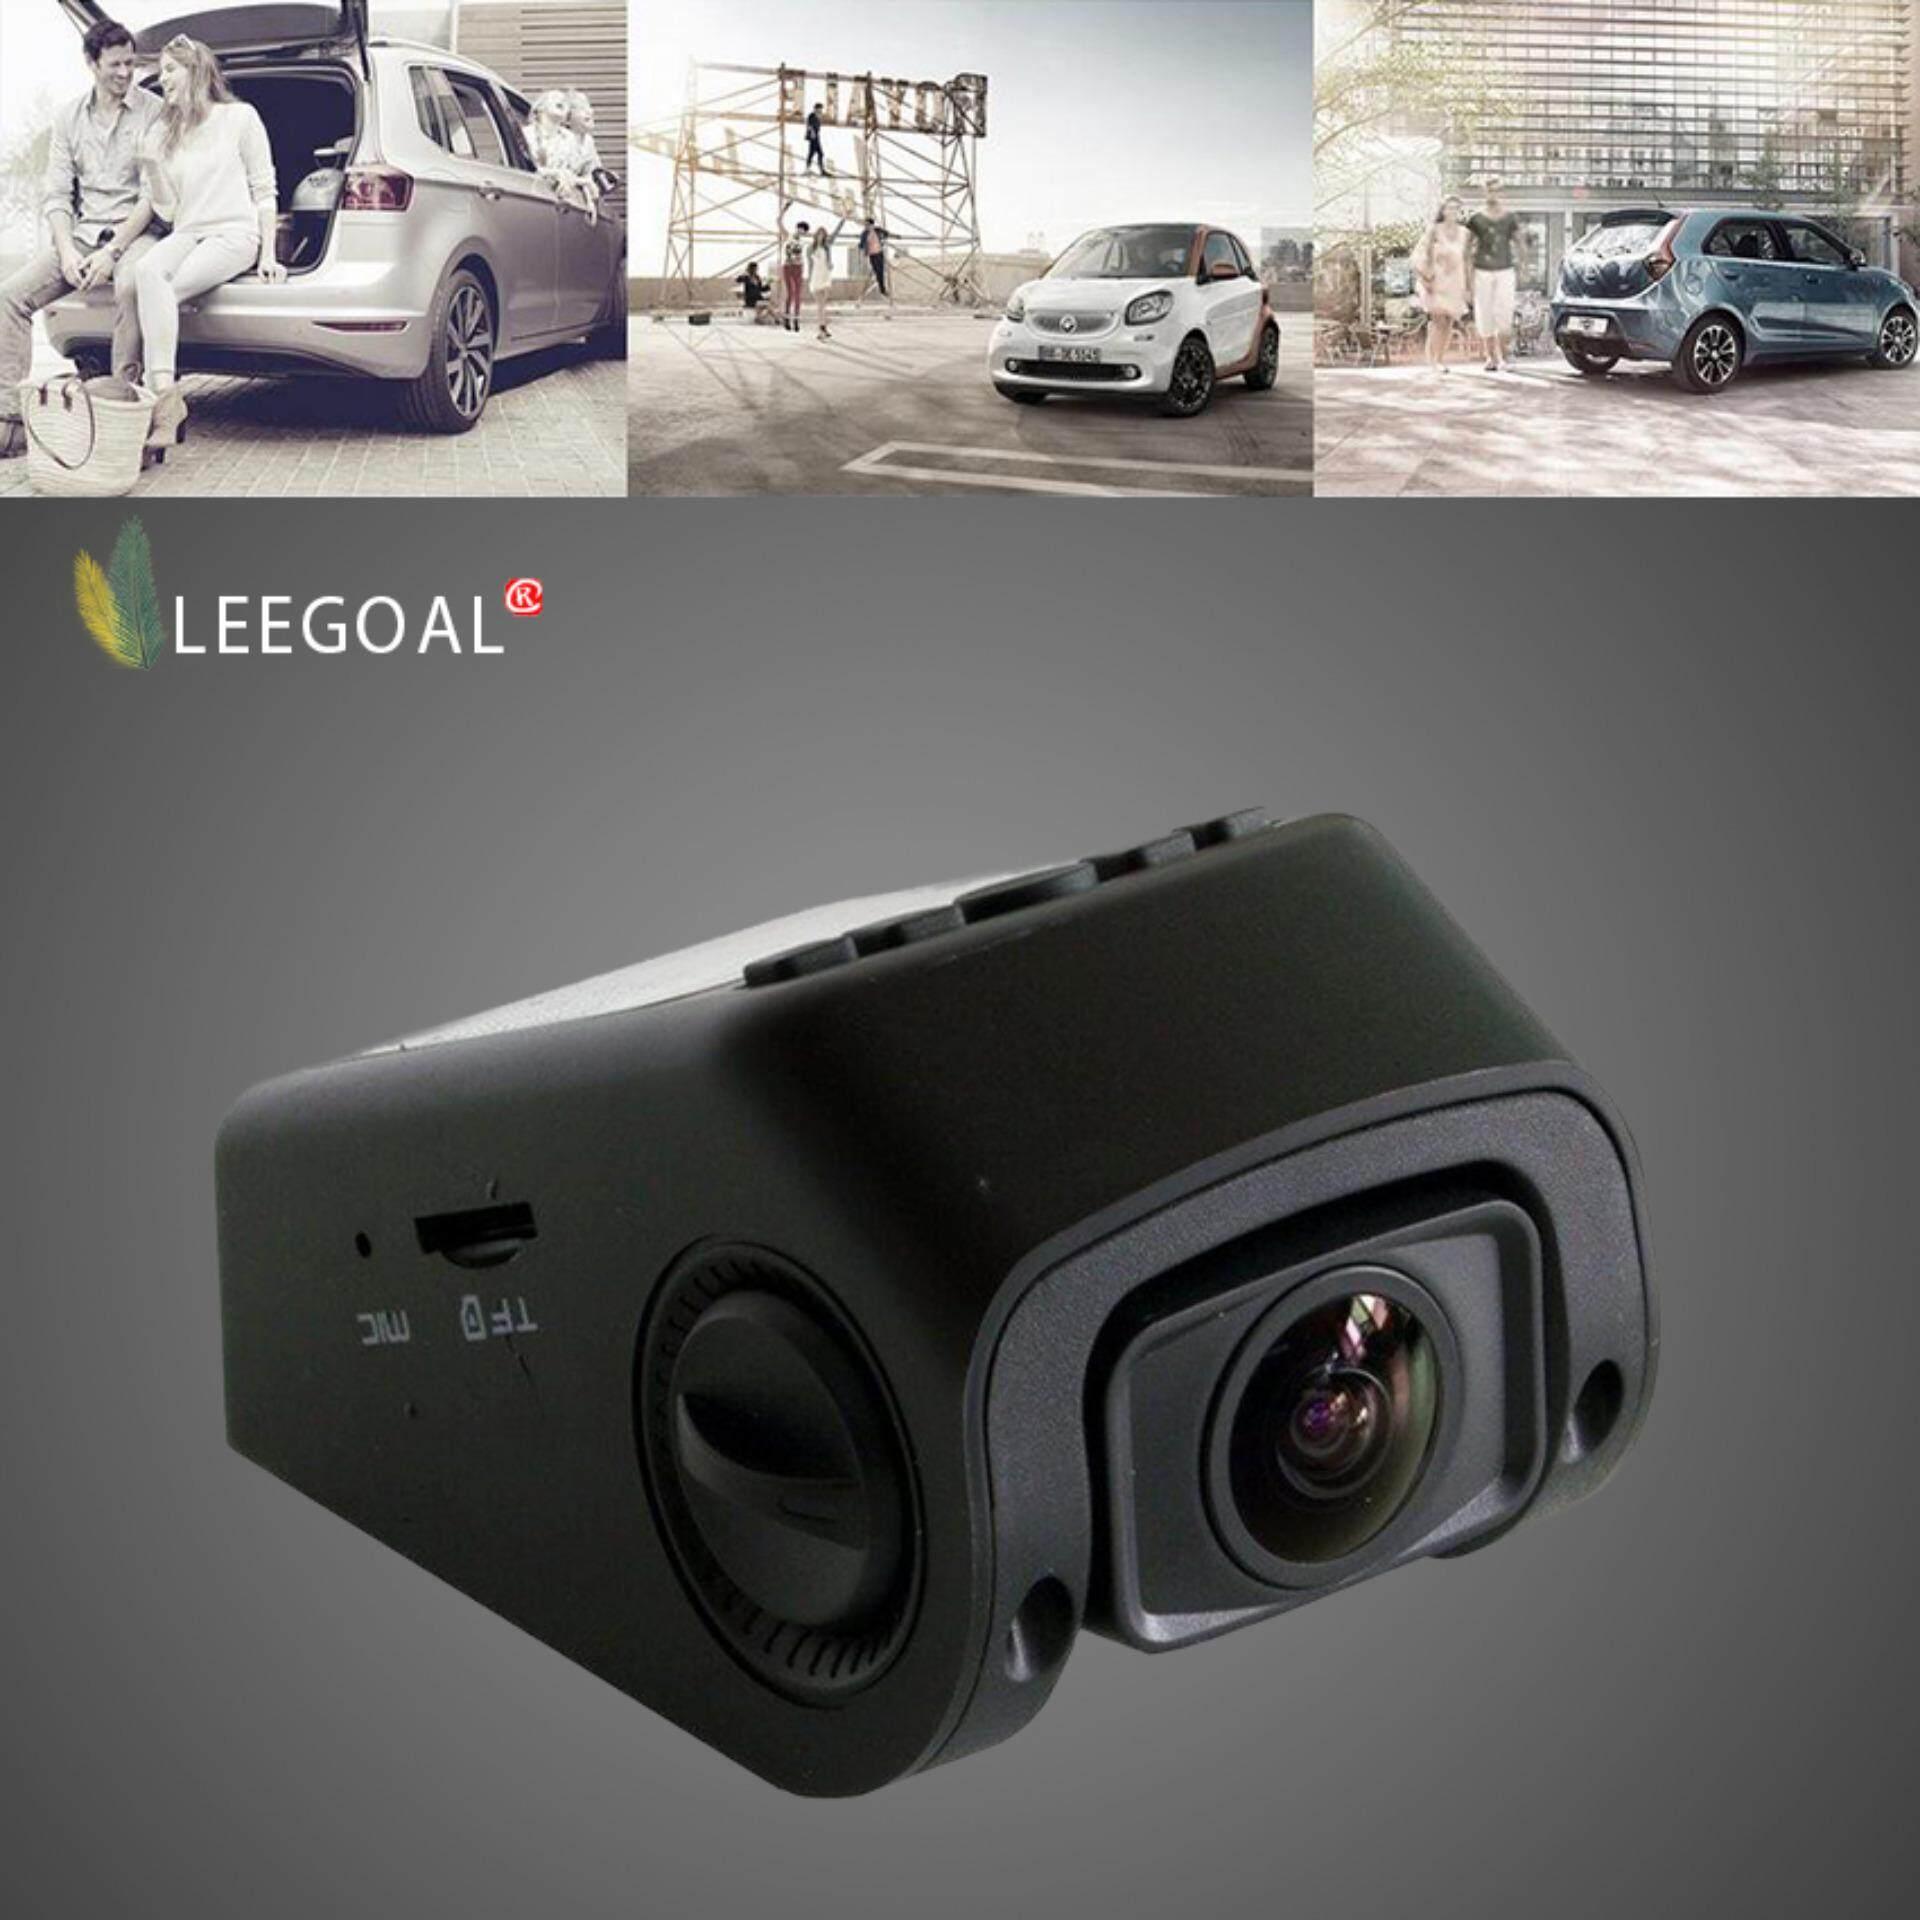 Comparison of JvGood and leegoal Car Cameras reviews